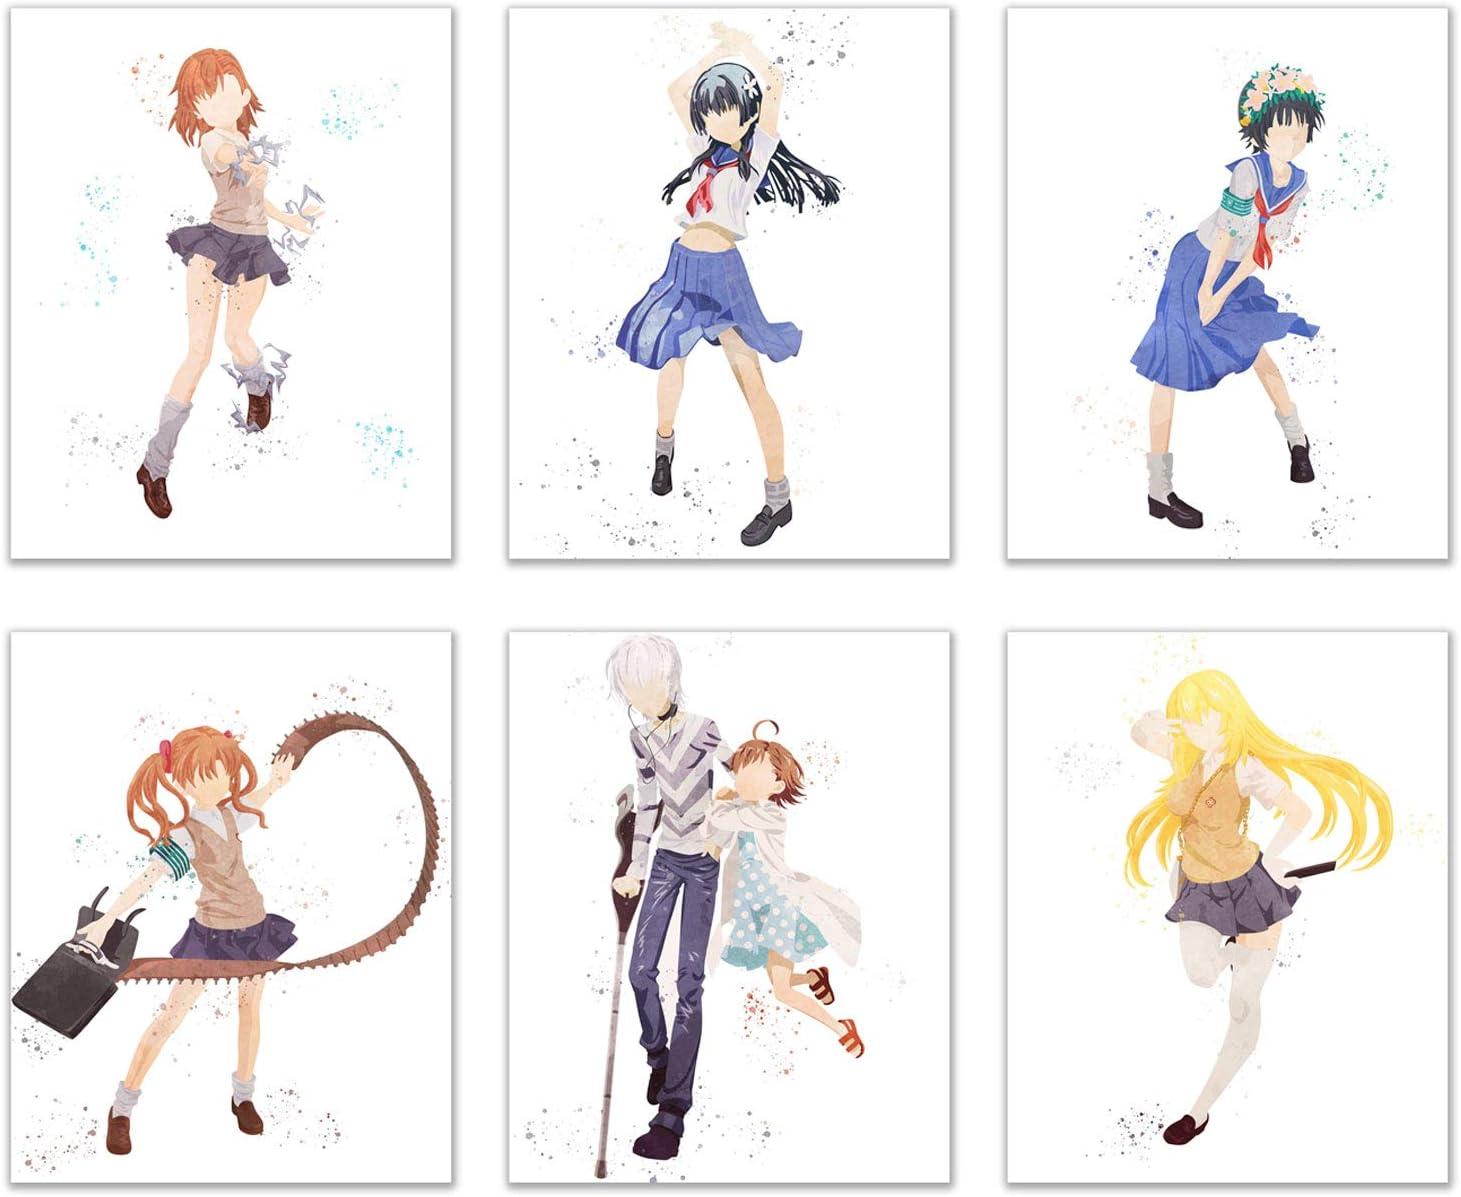 Watercolor Toaru Kagaku no Railgun T Prints - Set of 6 (8x10 Inches) A Certain Scientific Wall Art Decor - Mikoto Misaka - Kuroko Shirai - Ruiko Saten - Misaki Shokuhou - Kazari Uihara - Accelerator -